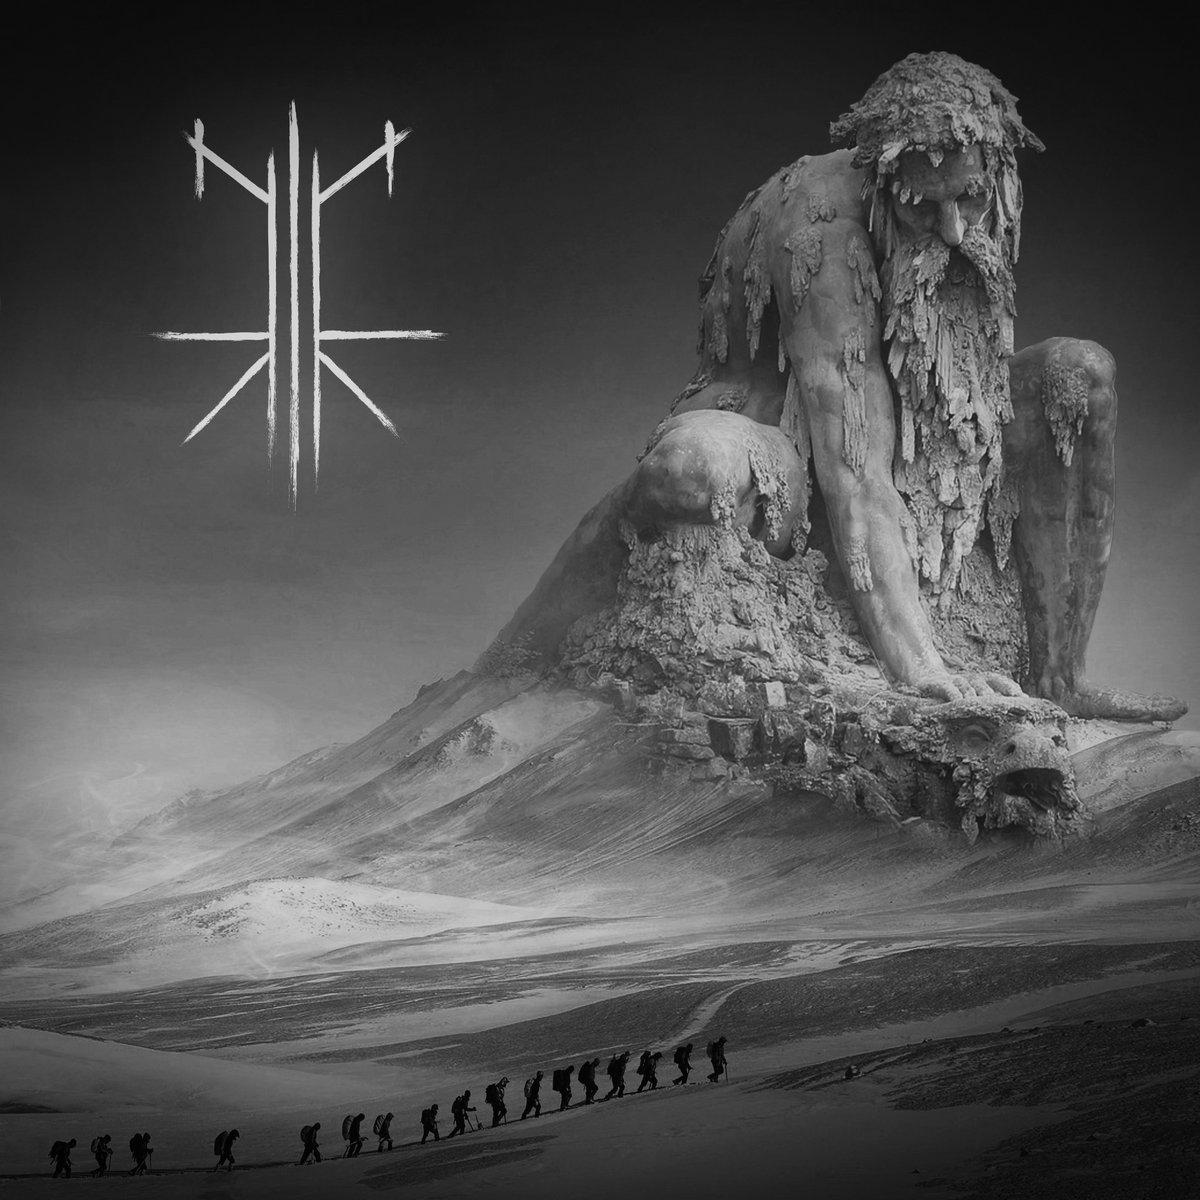 Iron Kings – Preternatural [EP] (2018)